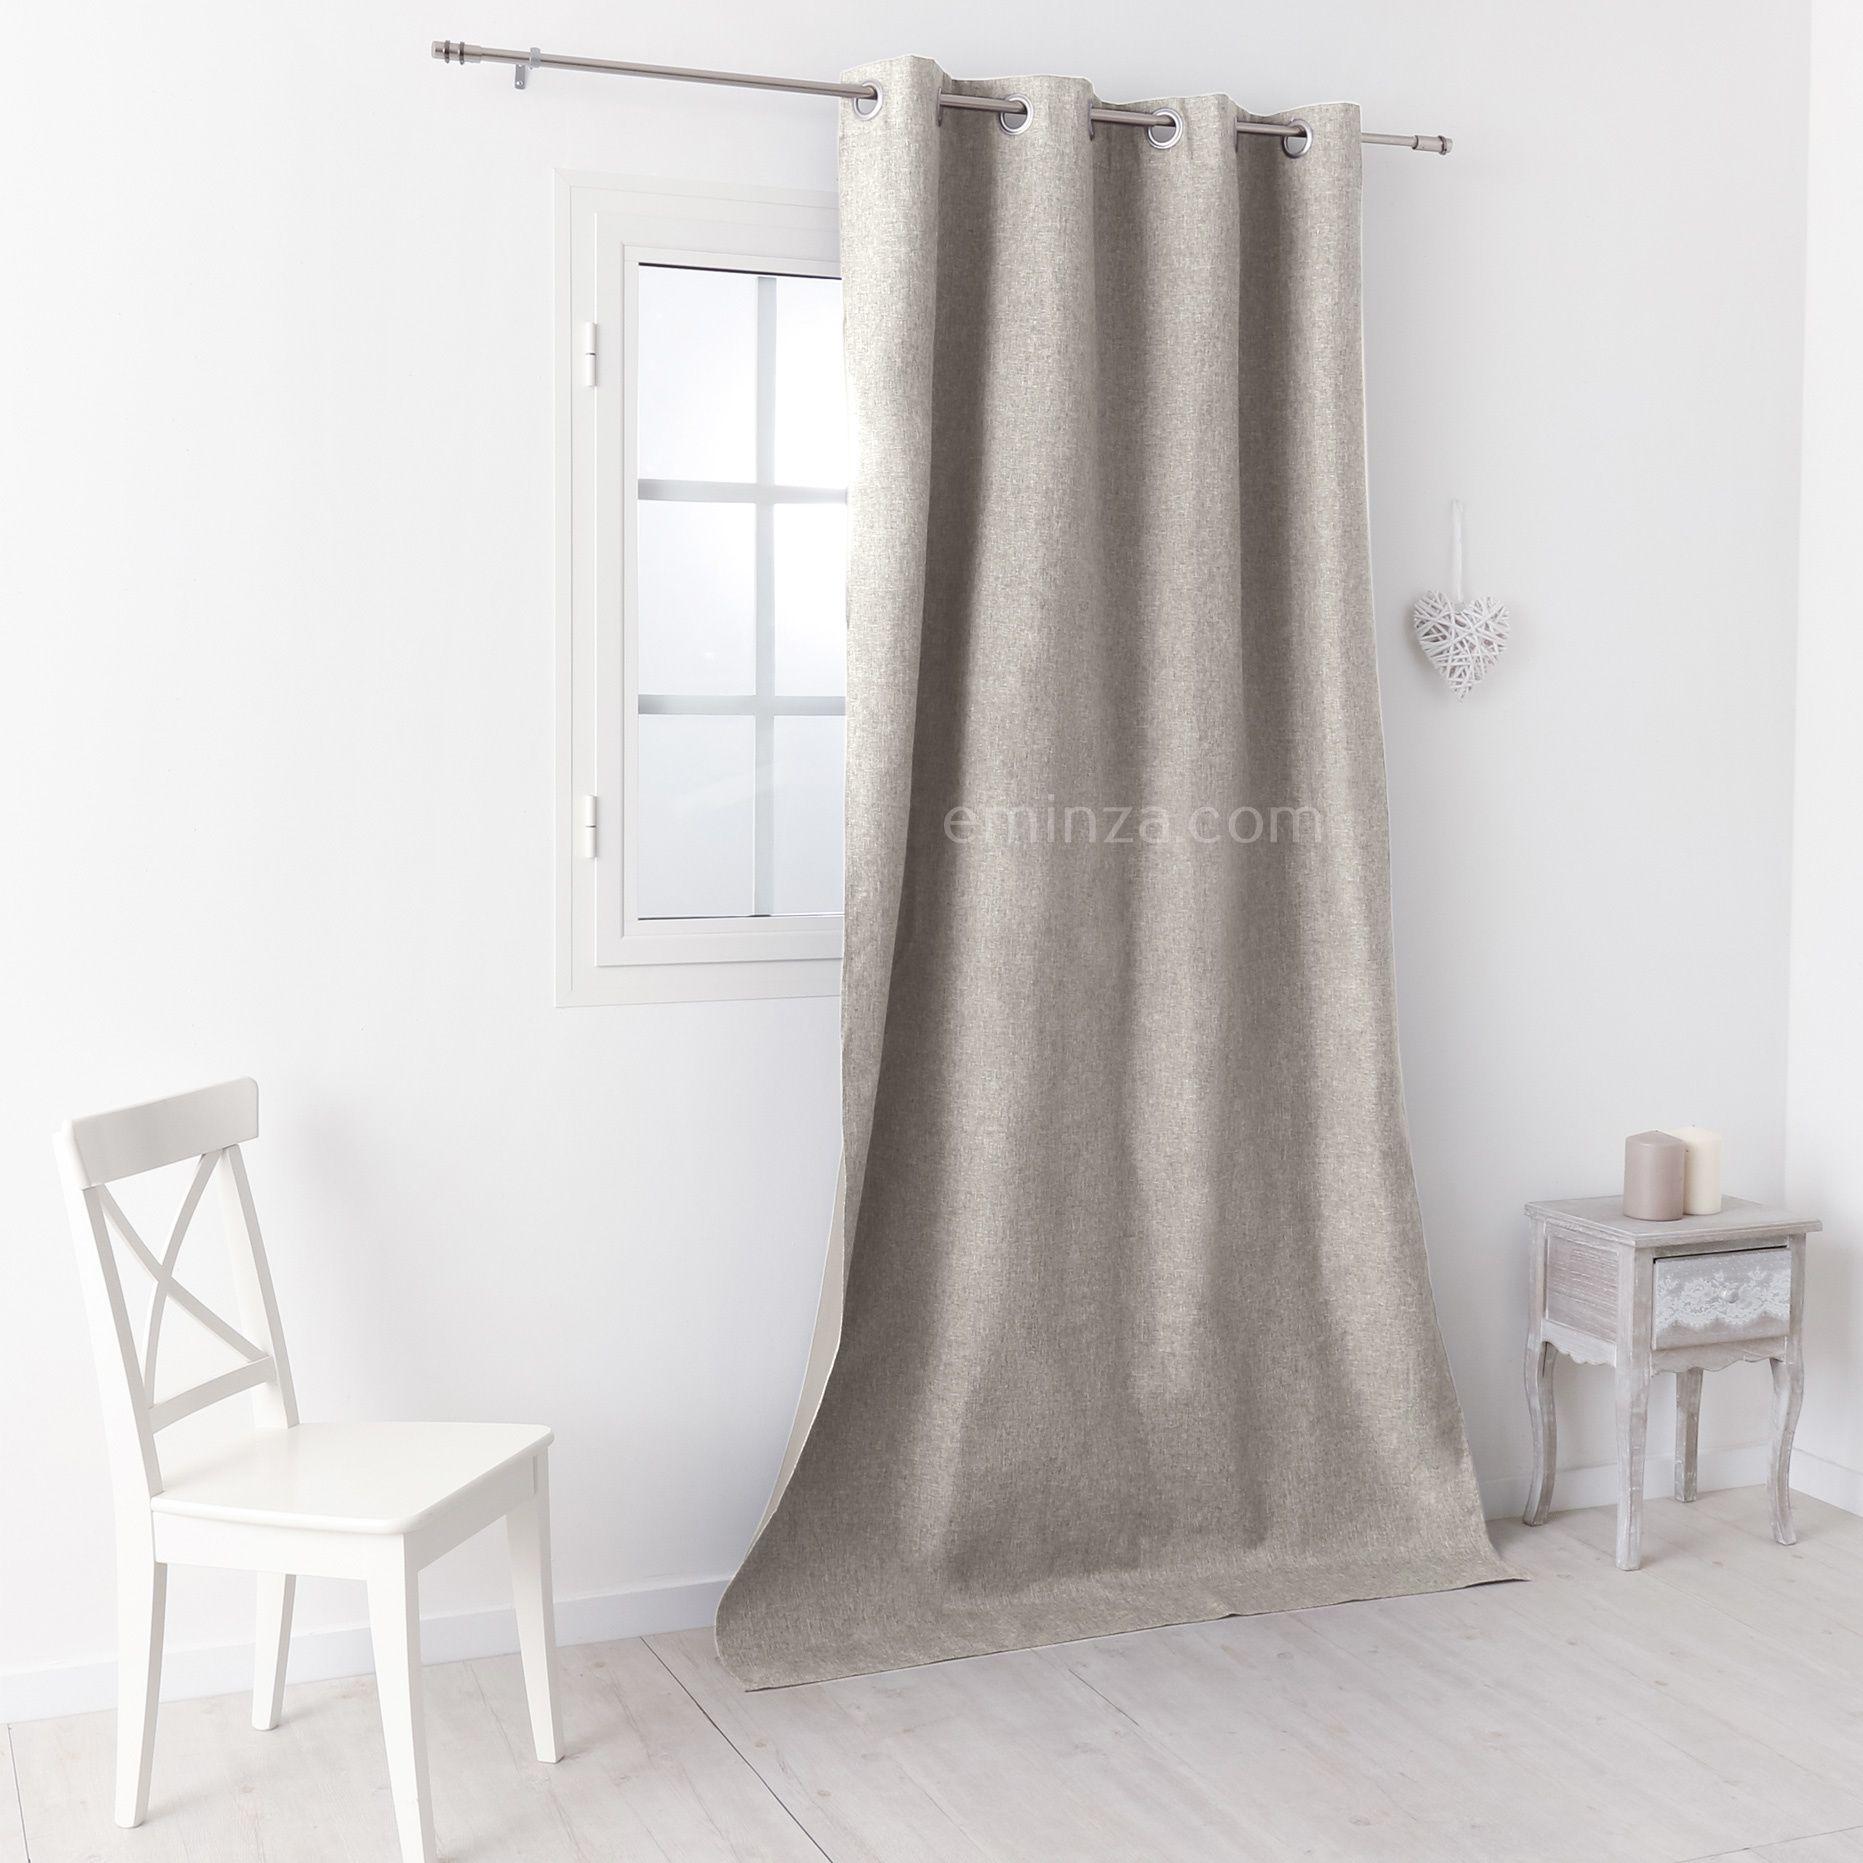 rideau occultant 140 x 260 cm faux uni lin rideau occultant eminza. Black Bedroom Furniture Sets. Home Design Ideas